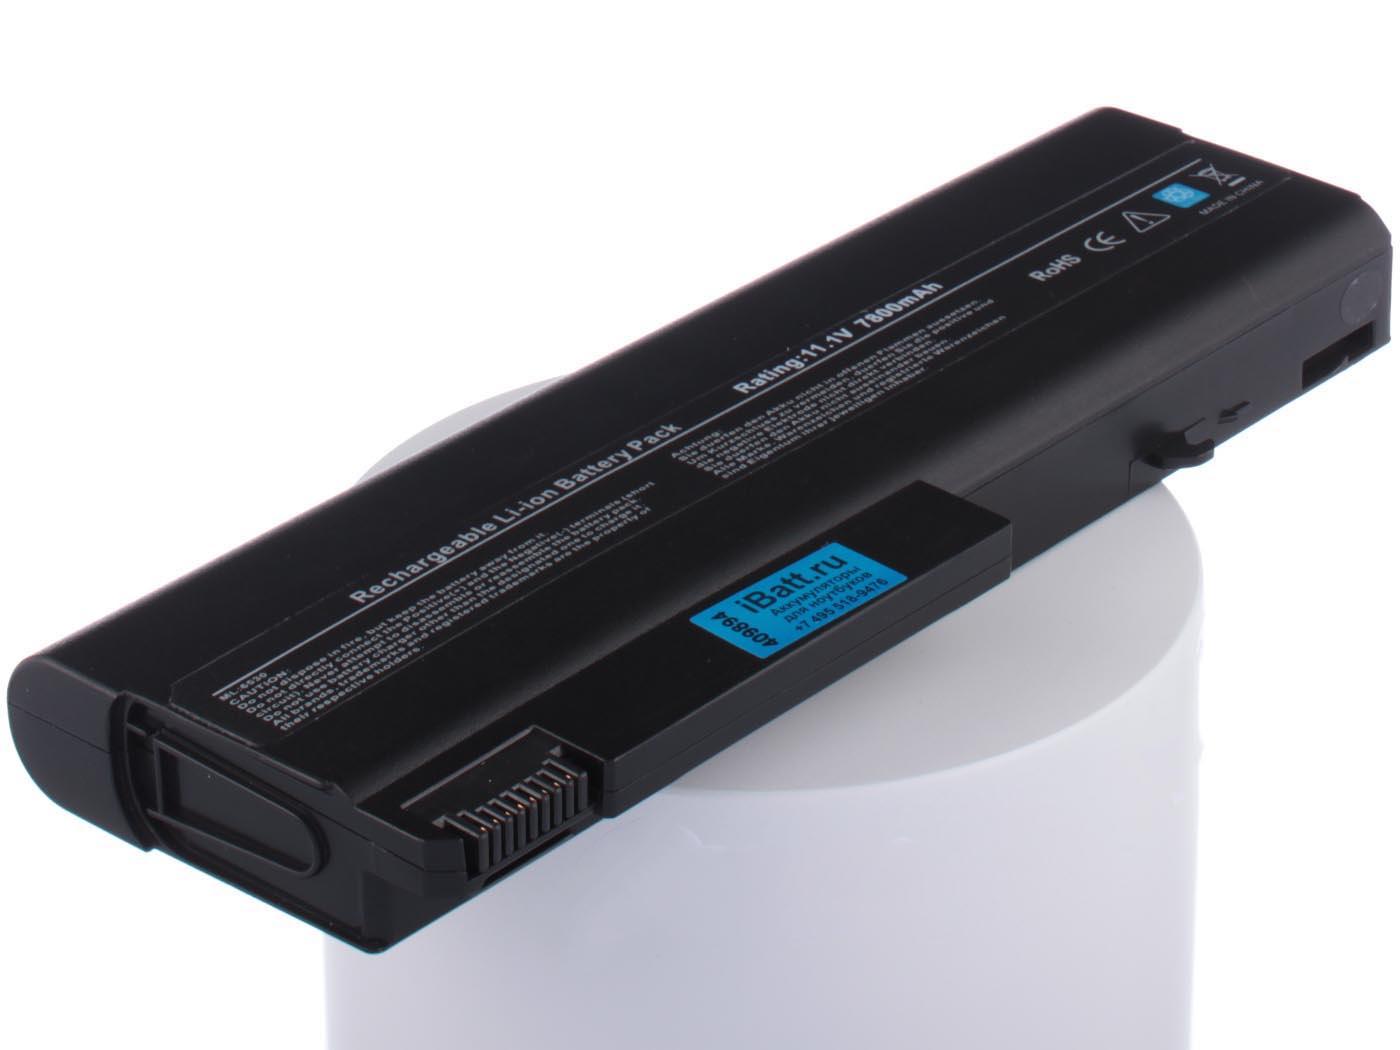 Фото - Аккумулятор для ноутбука iBatt для HP-Compaq EliteBook 8440p, ProBook 6550b, EliteBook 6930p, ProBook 6450b, 6730b, ProBook 6440b, 6530b, ProBook 6540b, 6735b, ProBook 645 G1, ProBook 6455b, ProBook 6555b, EliteBook 8440w, 6535b аккумуляторная батарея topon top 6730b 4400мач для ноутбуков hp compaq probook 6440b 6445b 6450b 6530b 6535b 6540b 6545b 6550b 6555b 6730b 6735b 6930p elitebook 8440p 8440w